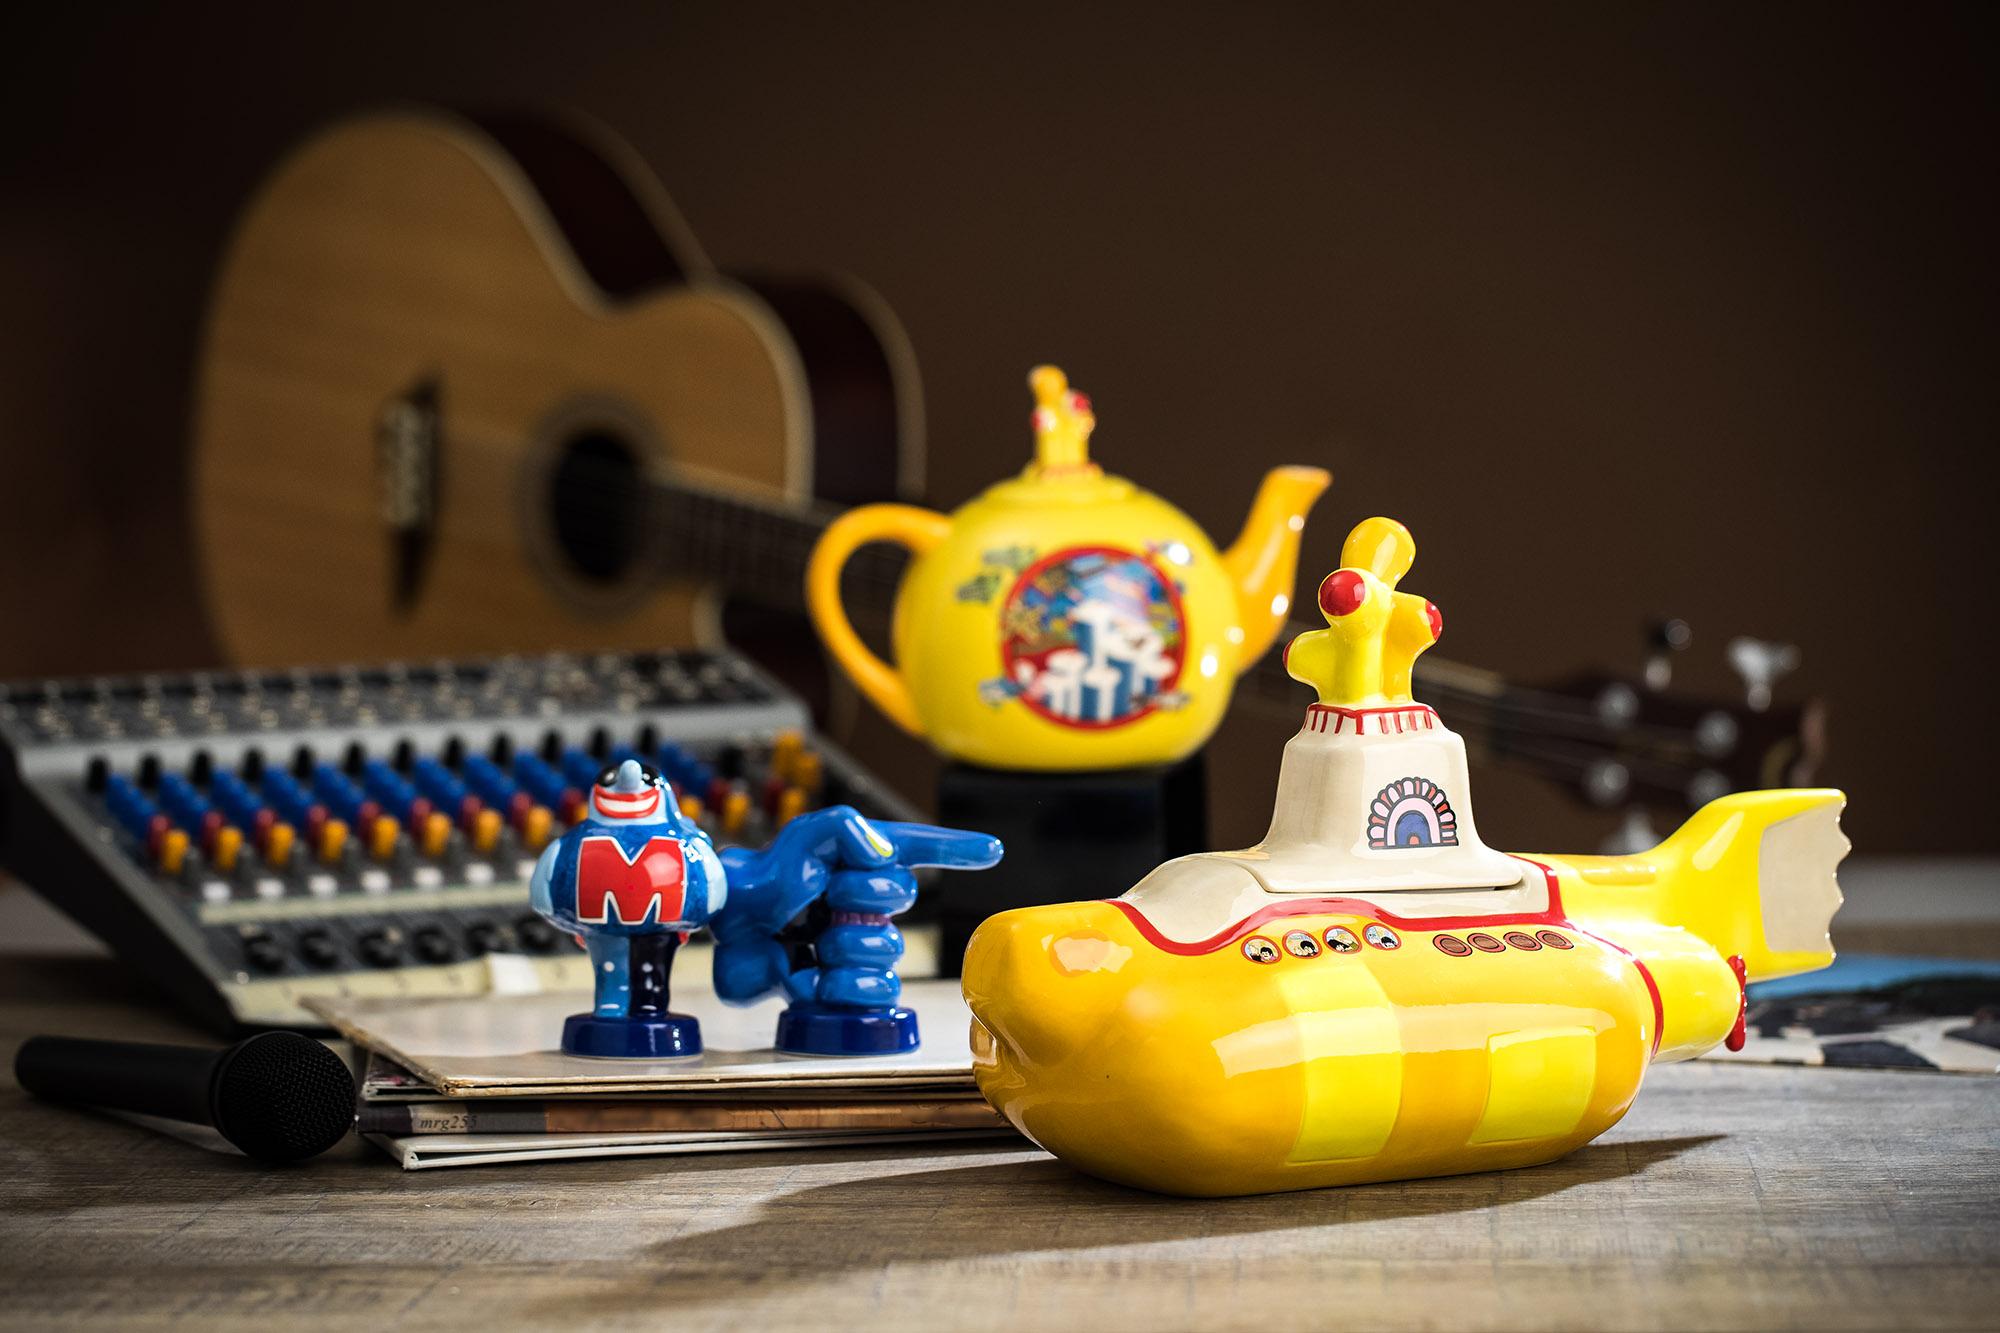 The Beatles Yellow Submarine Sculpted Cookie Jar, Salt & Pepper Shaker and Teapot